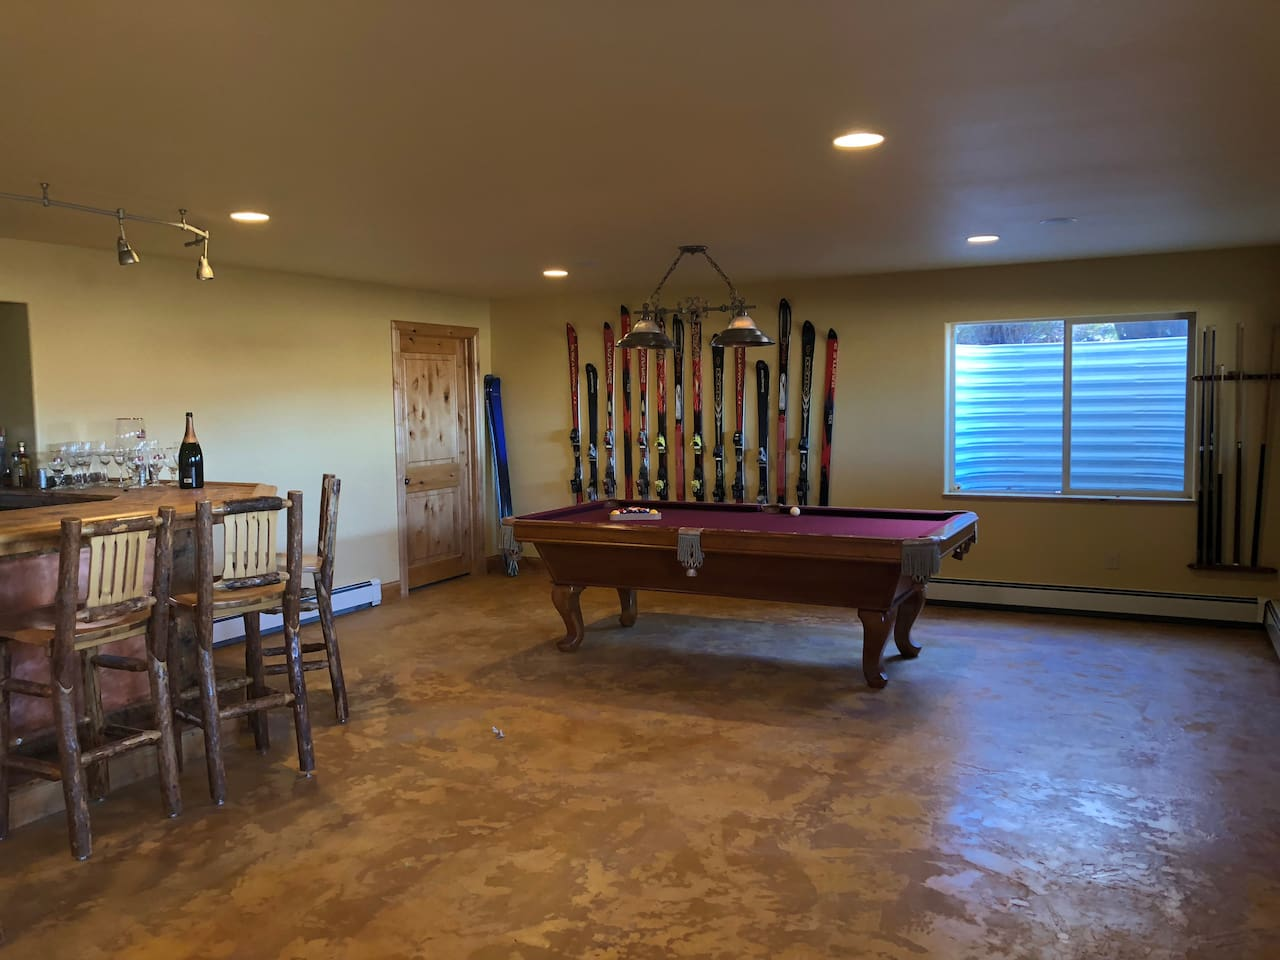 Bar & Pool Room